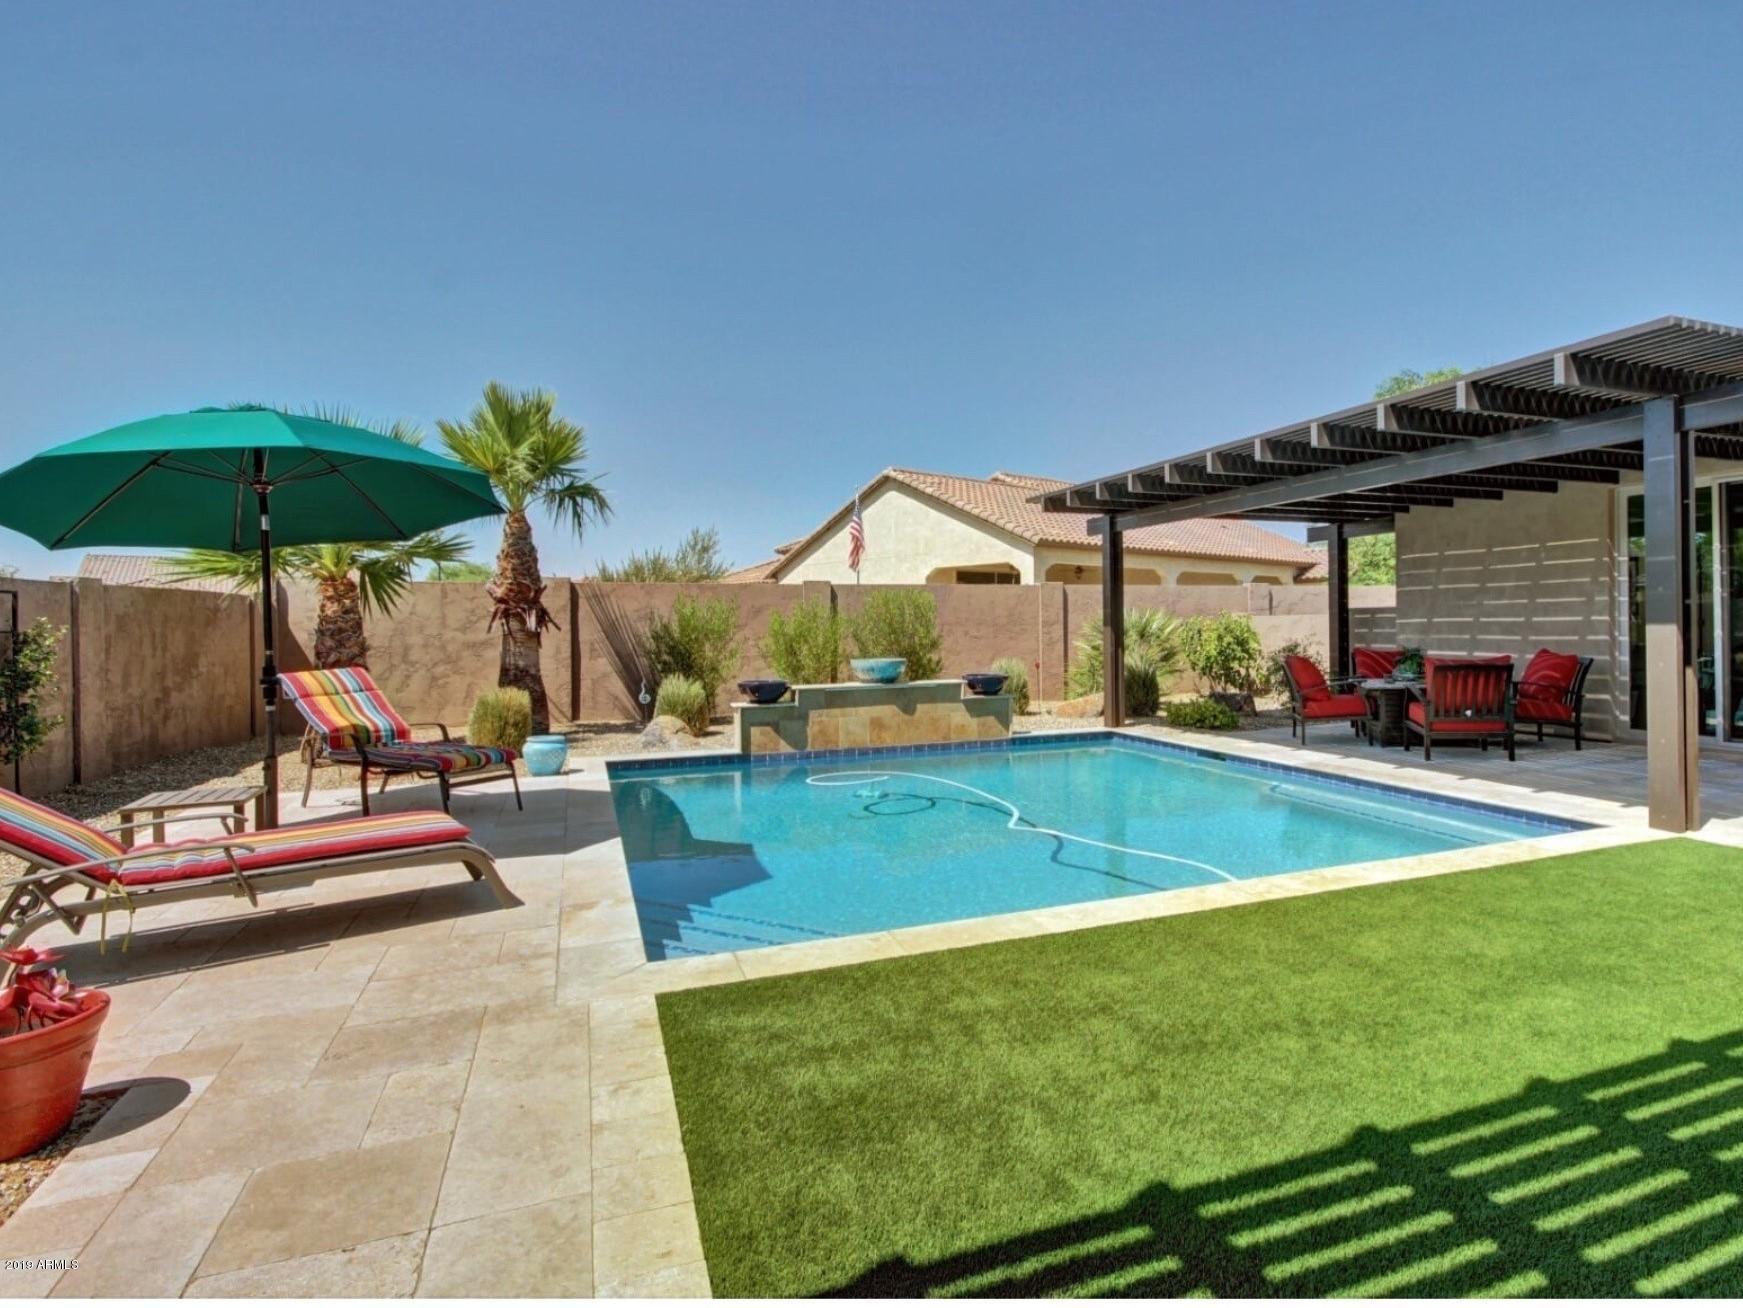 MLS 5911302 16635 W MONTE VISTA Road, Goodyear, AZ 85395 Goodyear AZ Private Pool